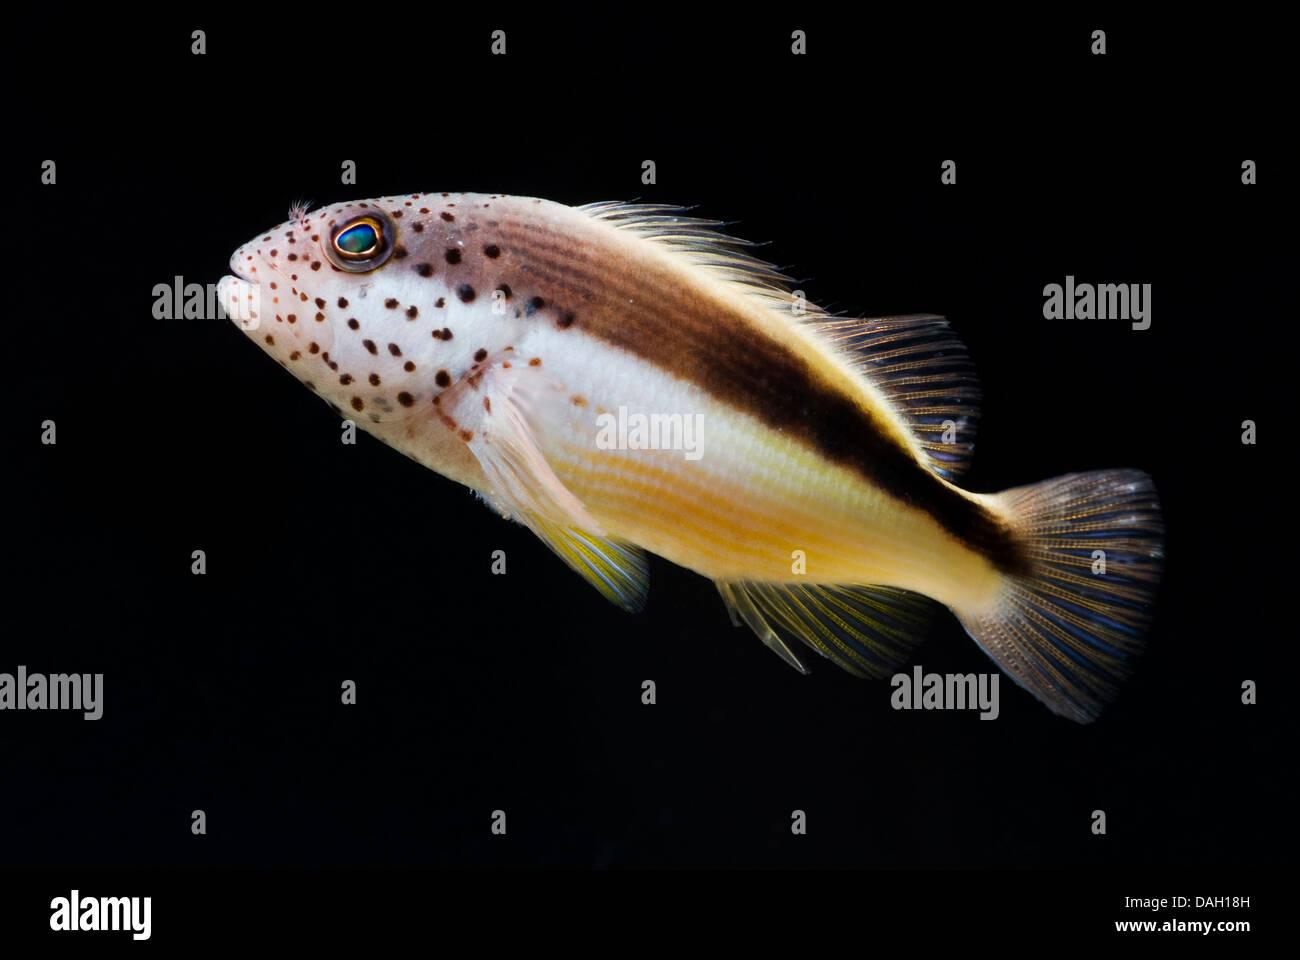 freckled hawkfish, Forster's hawkfish, blackside hawkfish (Paracirrhites forsteri), swimming - Stock Image